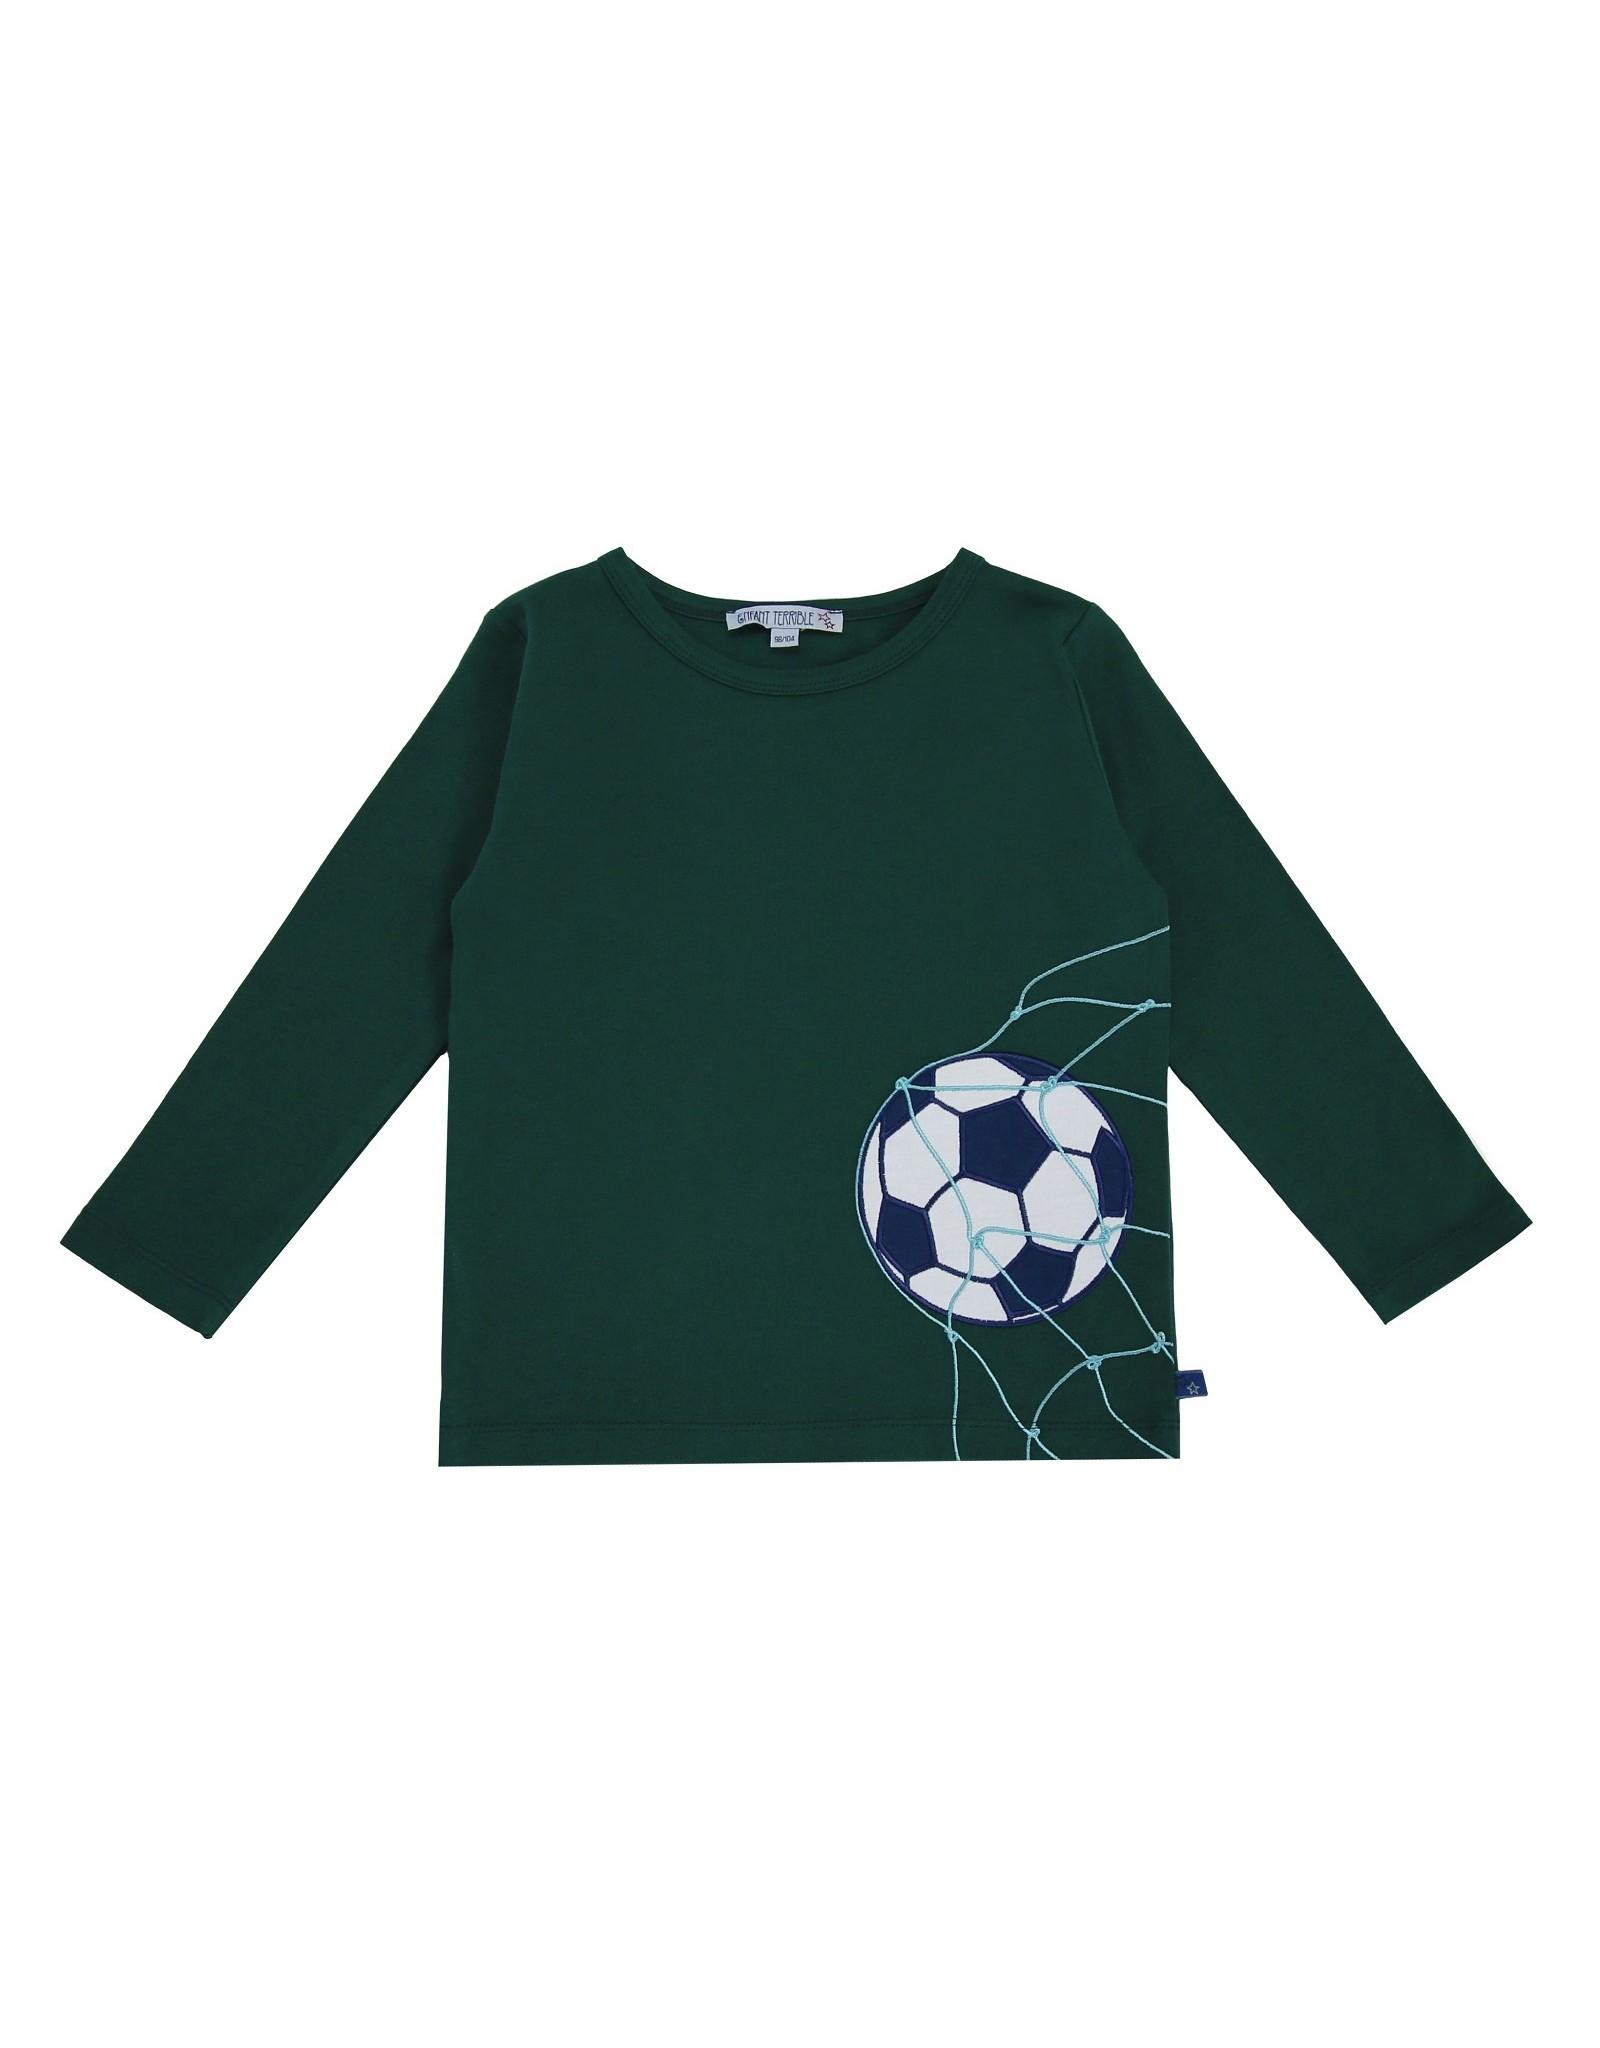 Enfant Terrible Kindershirt - voetbal shirt